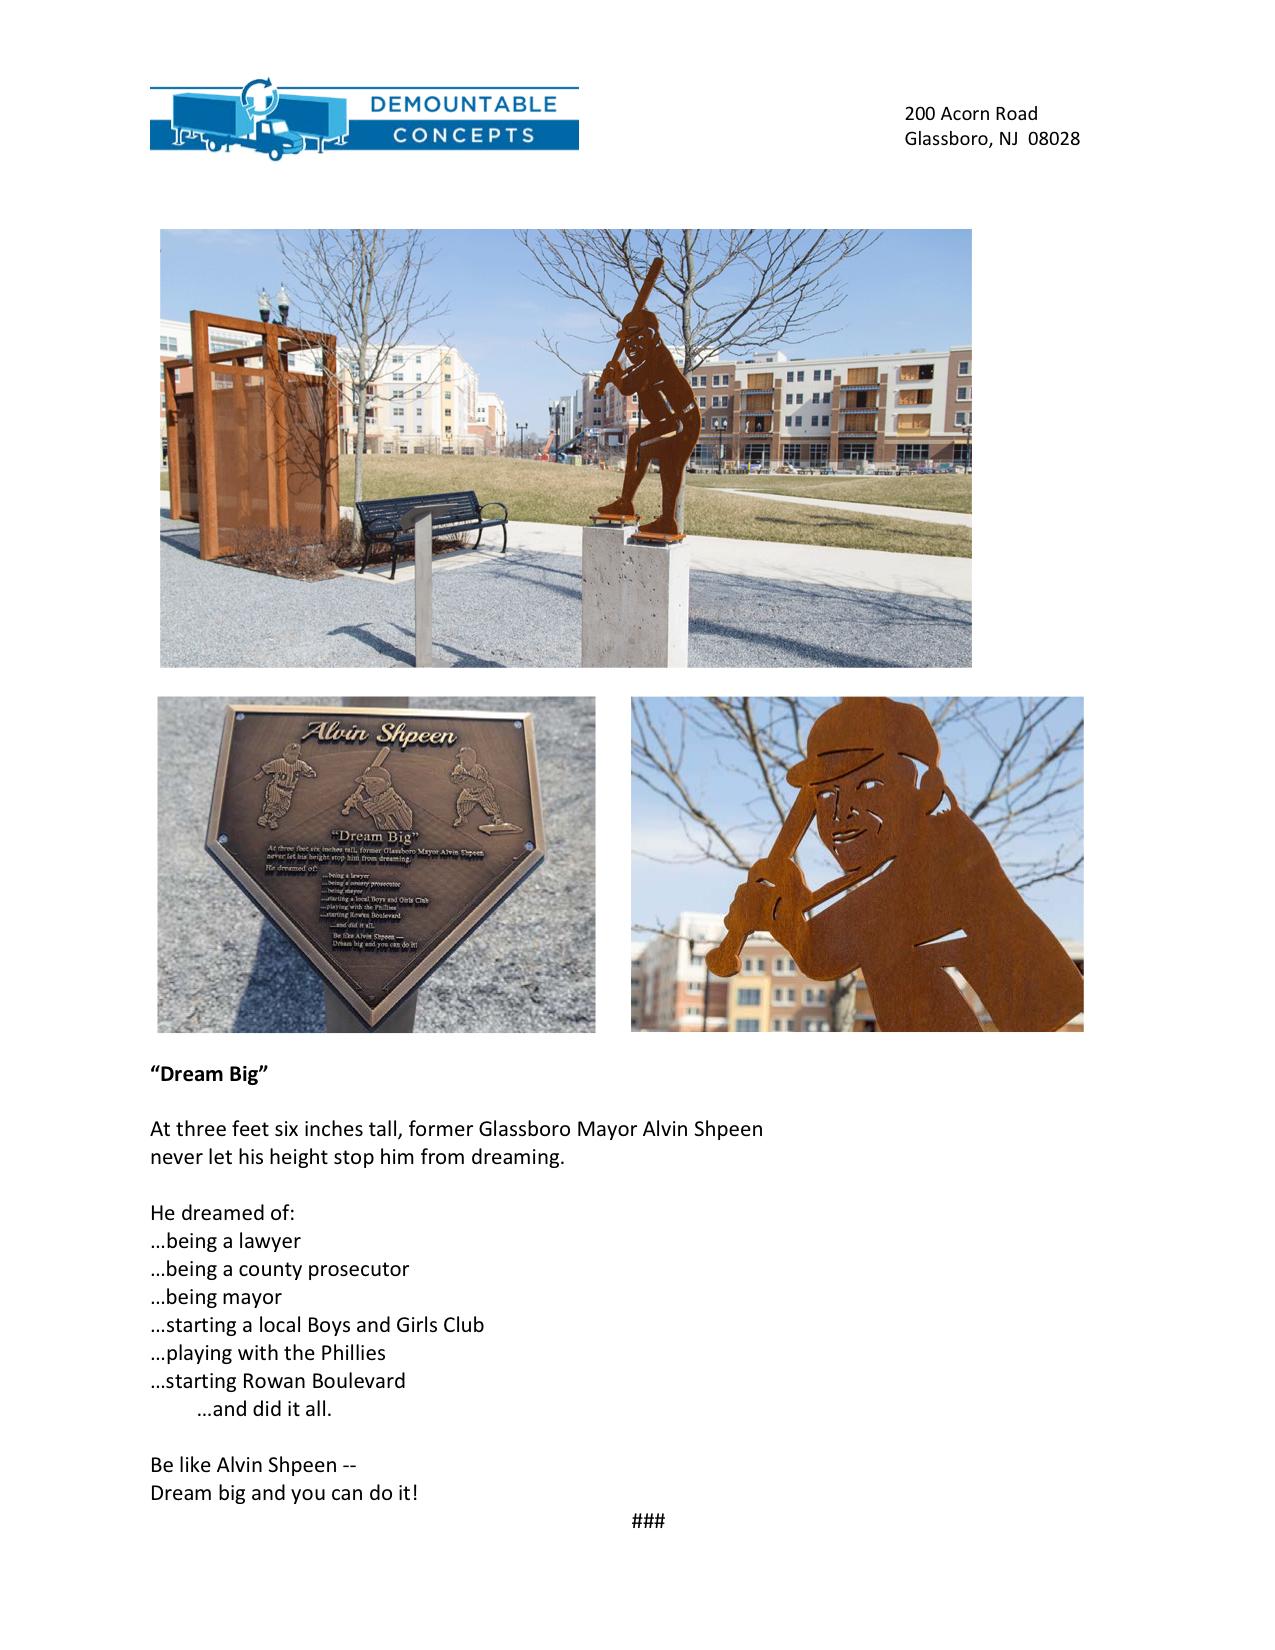 Sculpture-Donation-Press-Release copy.jpeg